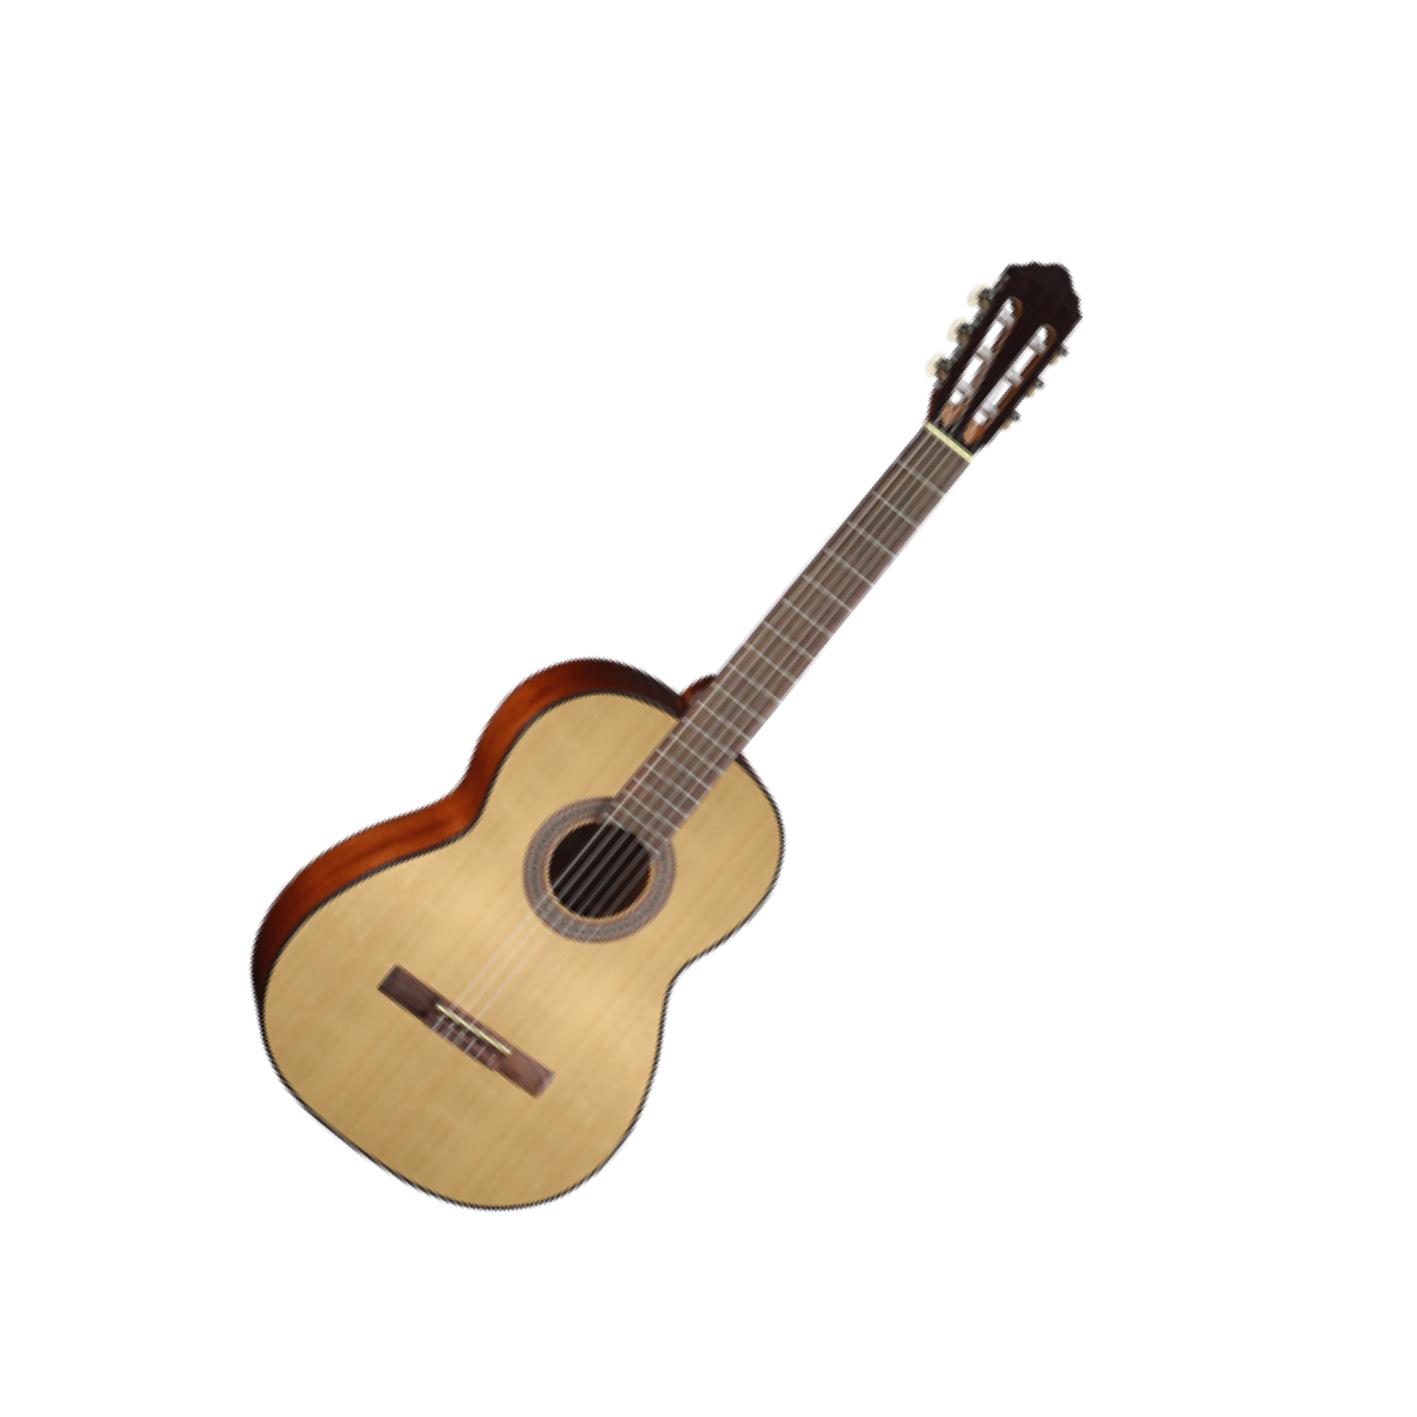 Cort AC100-BG-OP Classical Guitar w/ Bag